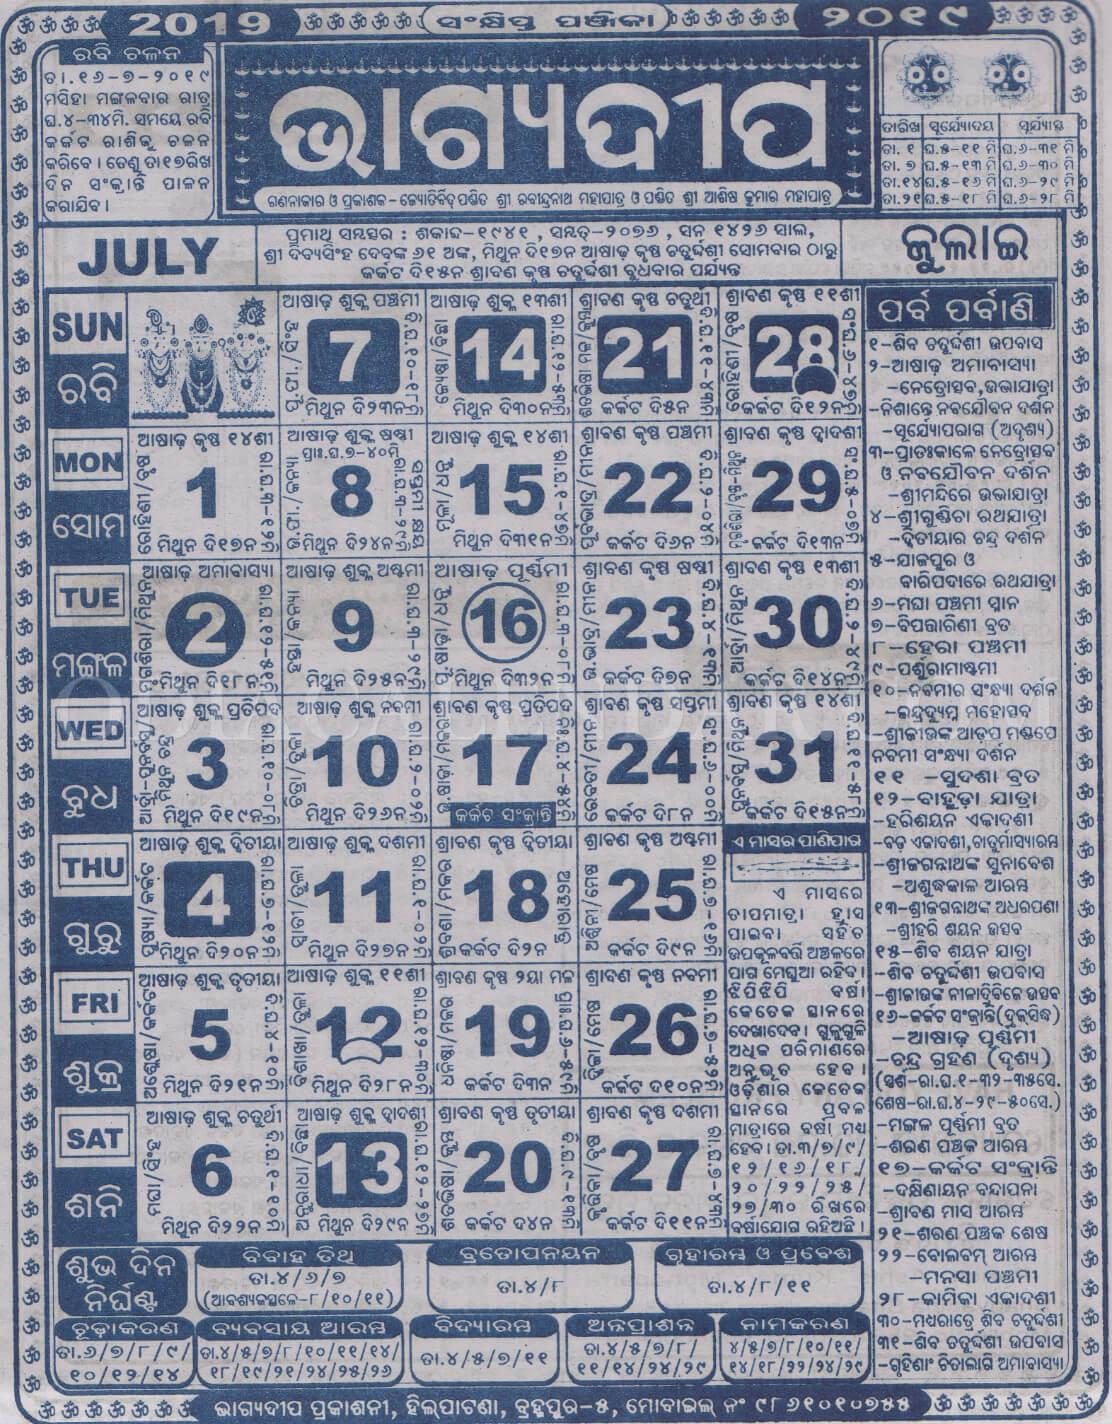 Odia Bhagyadeep Calendar 2020 July View And Download Free pertaining to Bhagyadipa Odia Calendar 2020